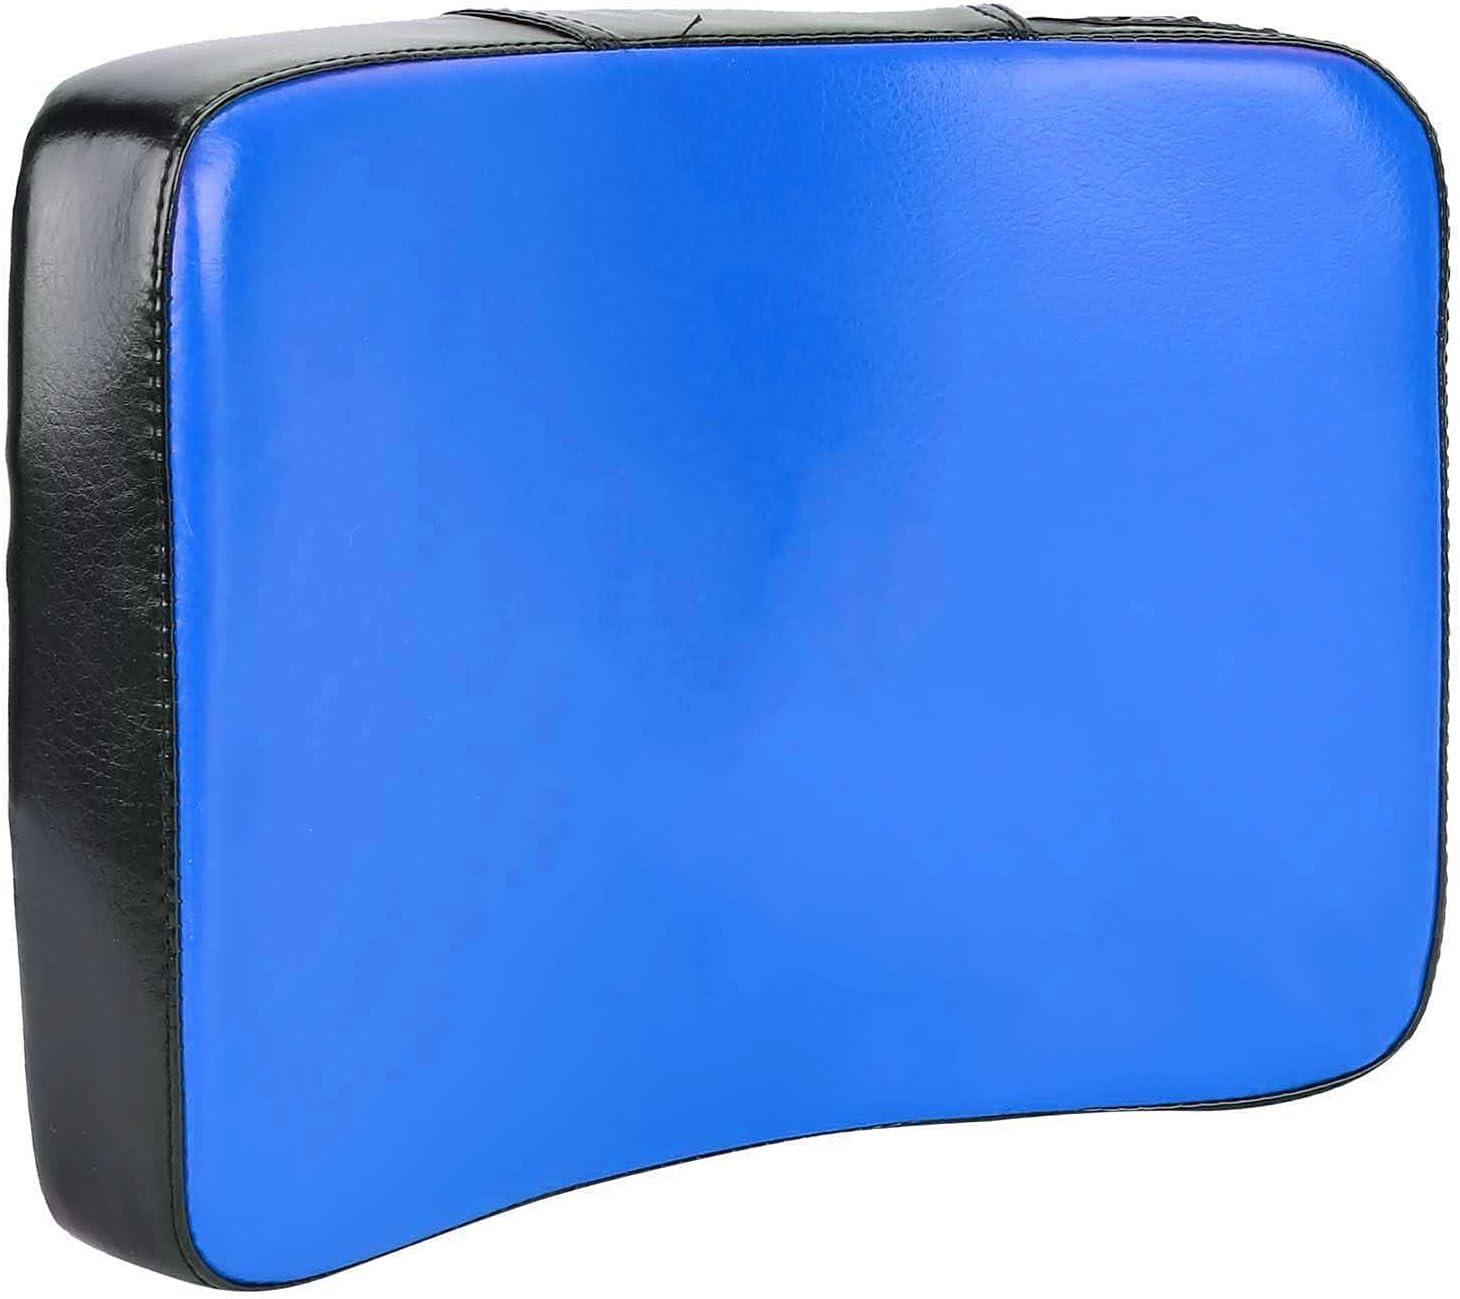 Muay Thai Pad EVA Foam free Liner Ki Space Shock Absorb Side Max 67% OFF Leather